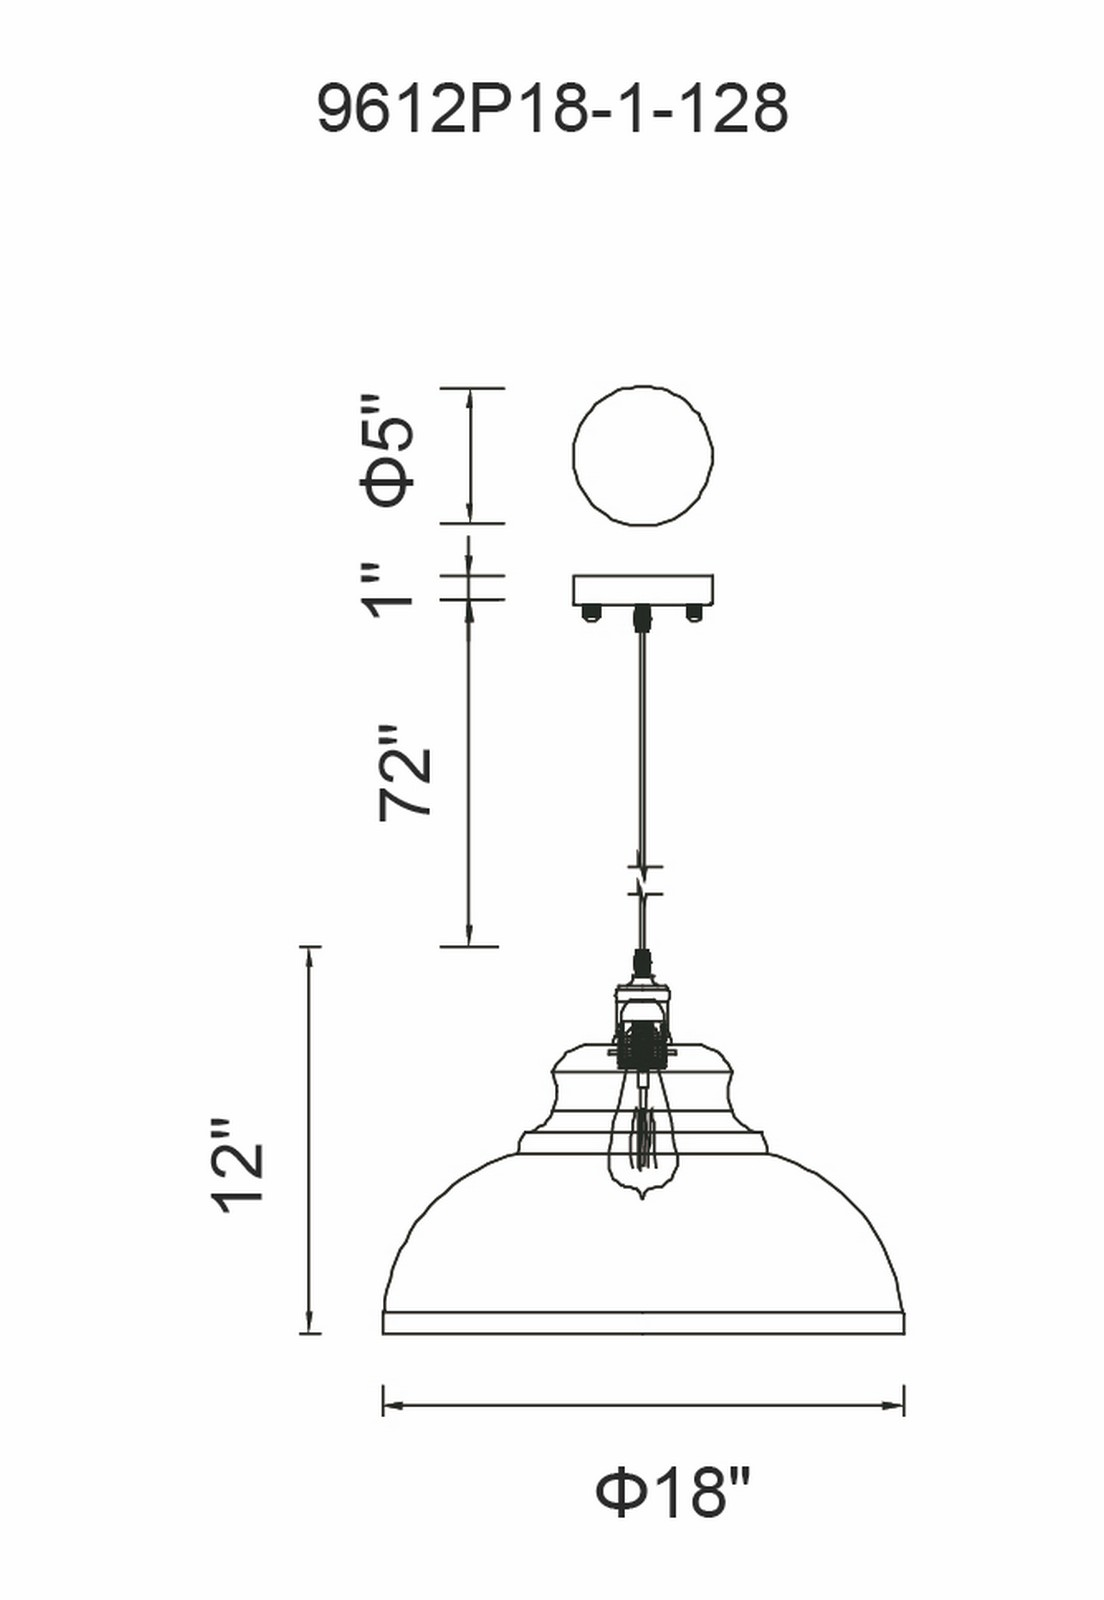 CWI Lighting Vogel 1 Light Down Pendant With Antique Copper Model: 9612P18-1-128 Line Drawing